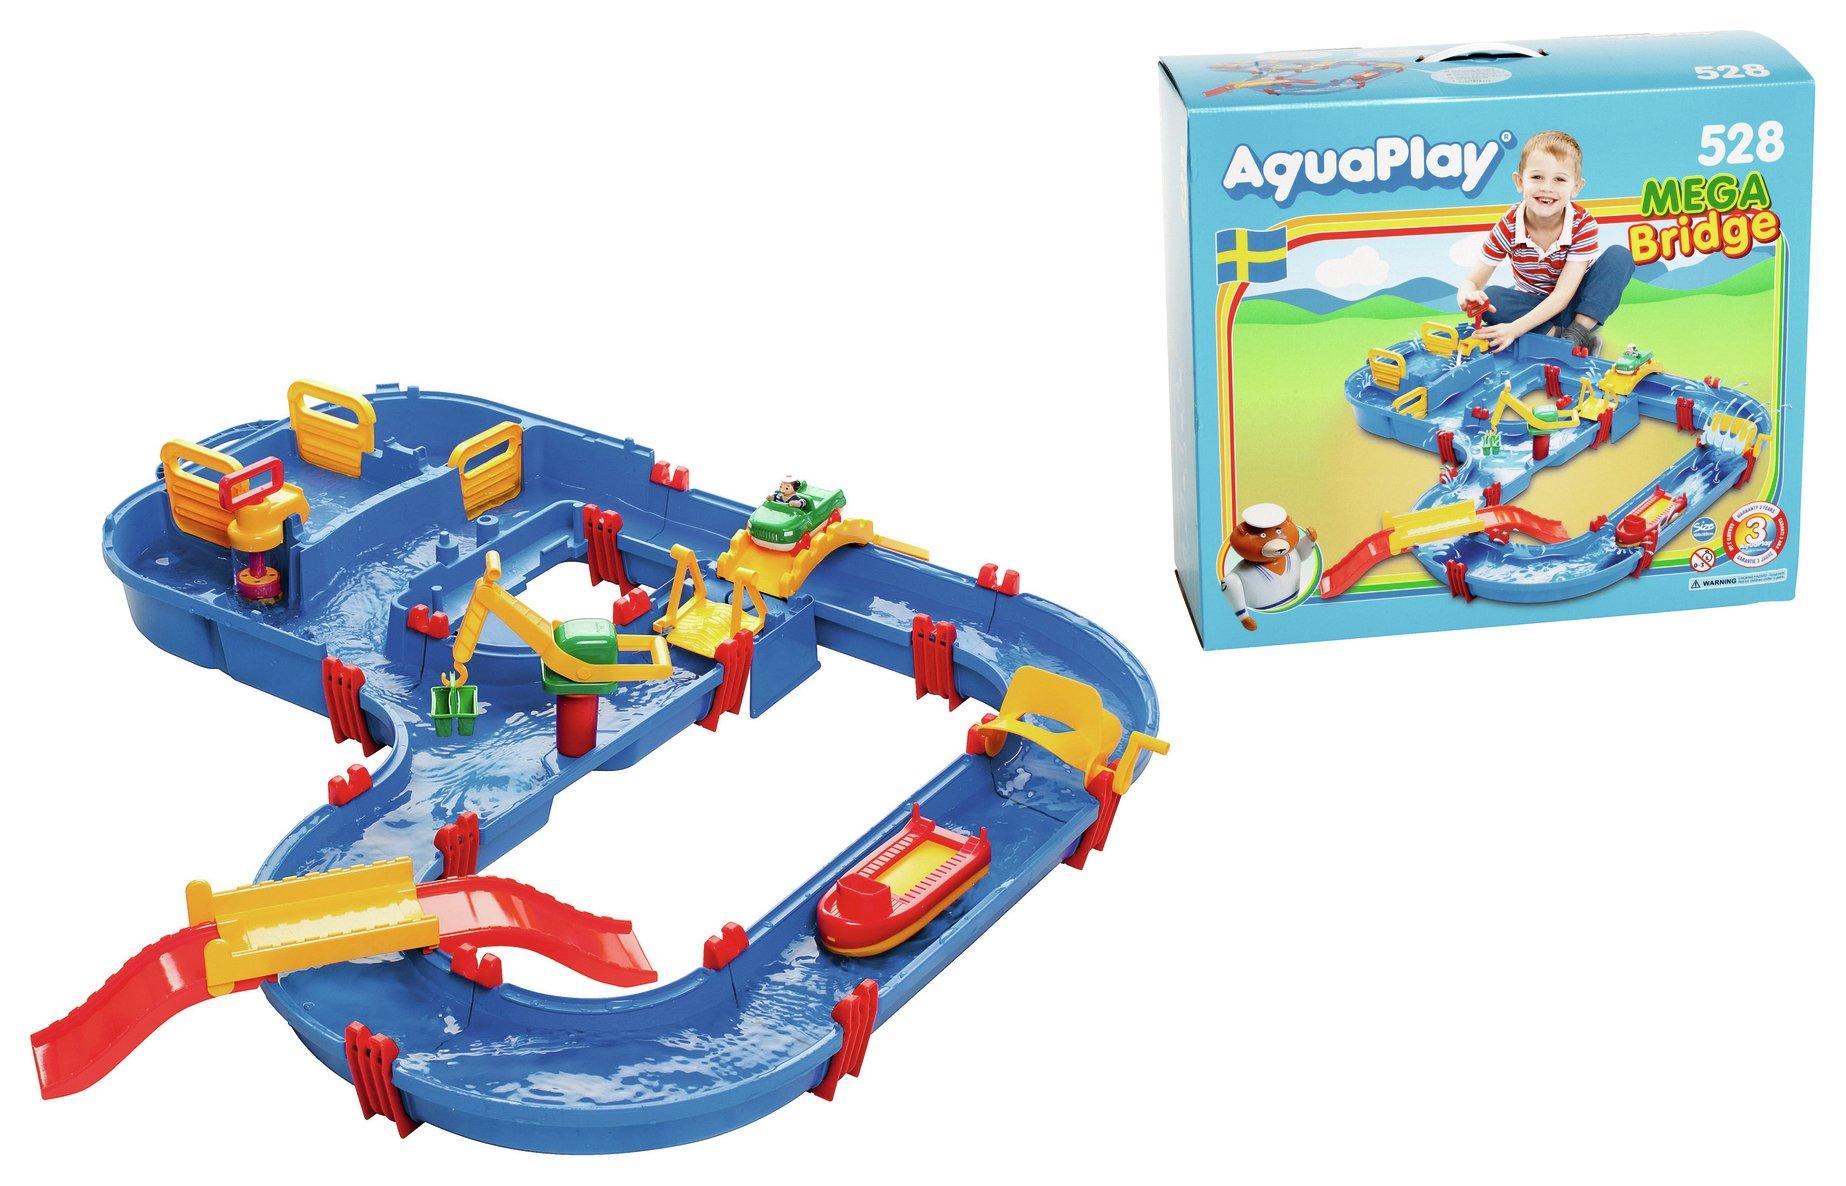 Image of Aqua Play Megabridge.